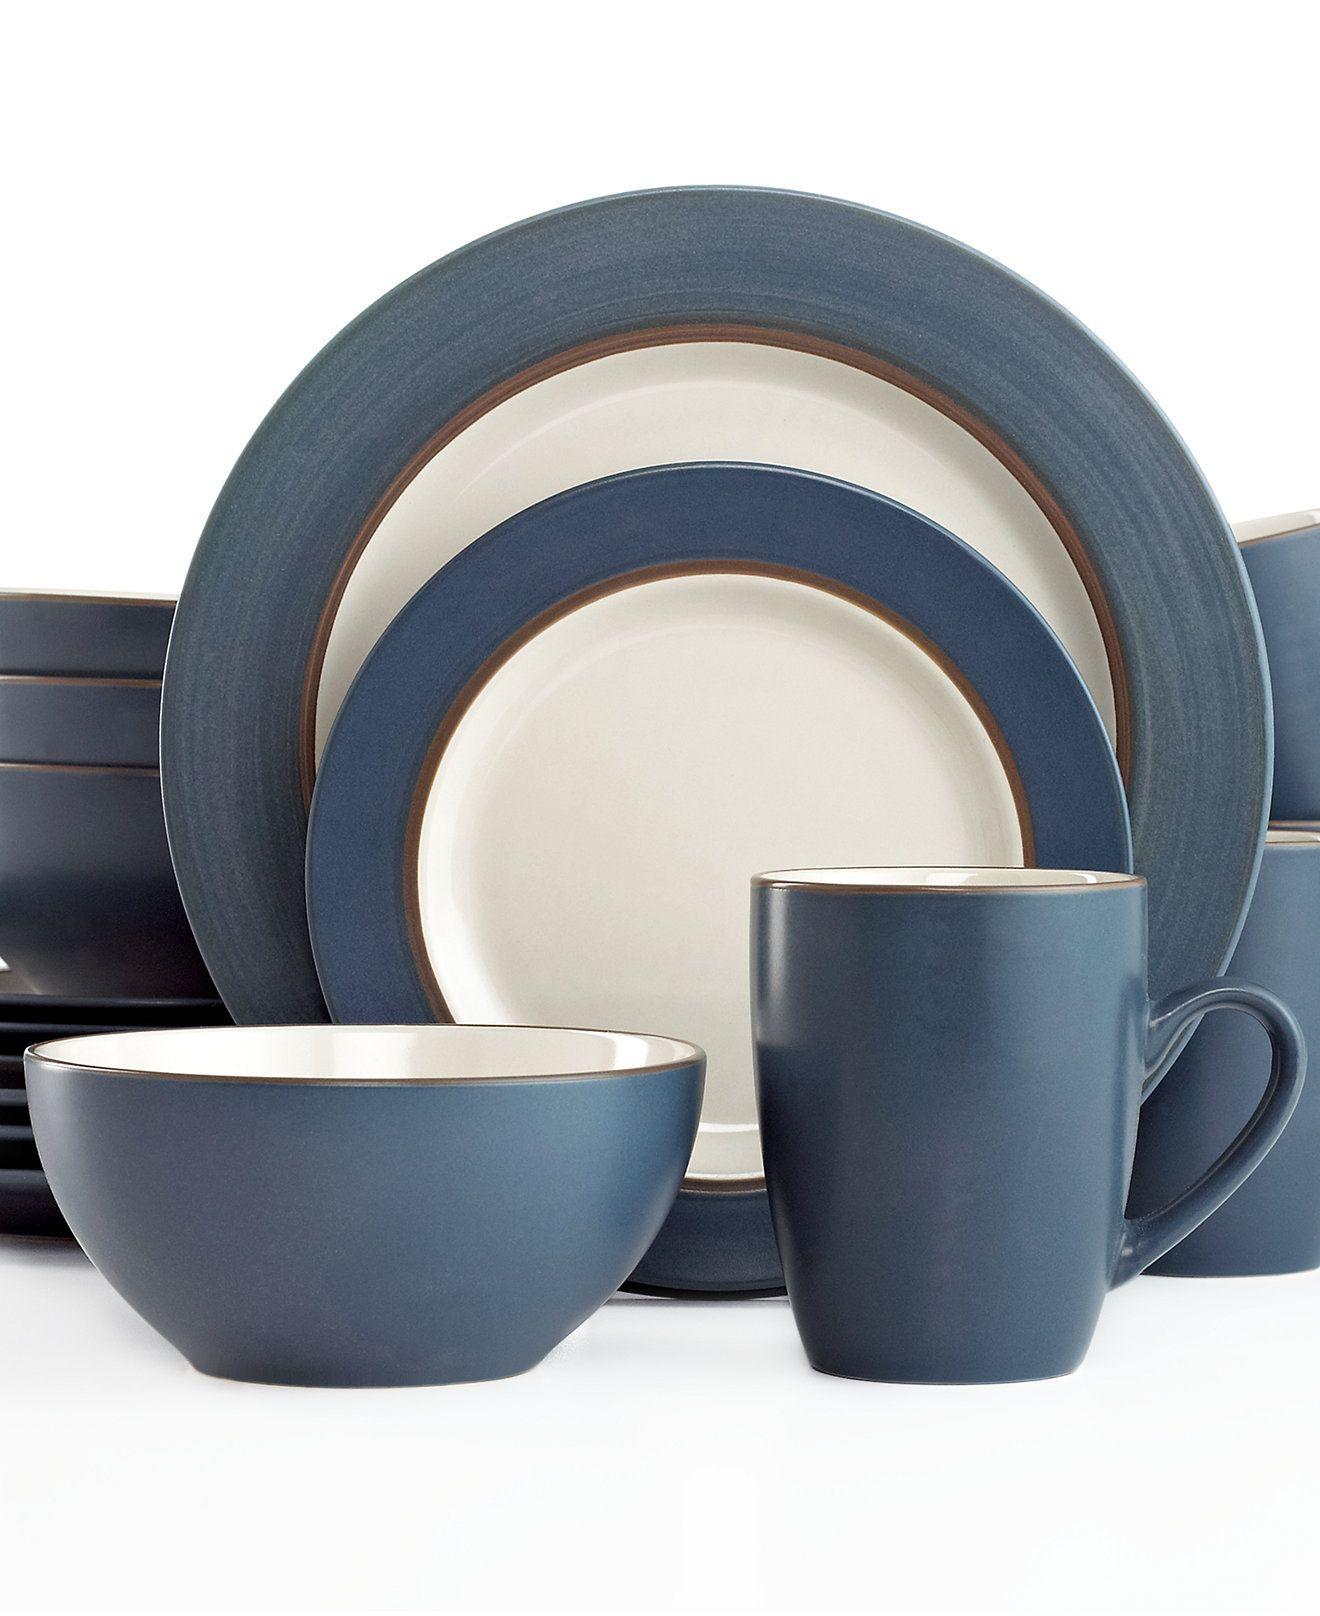 Thomson Pottery Kensington Stone 16-Pc. Set Service for 4 - Casual Dinnerware  sc 1 st  Pinterest & Thomson Pottery Kensington Stone 16-Pc. Set Service for 4 - Casual ...